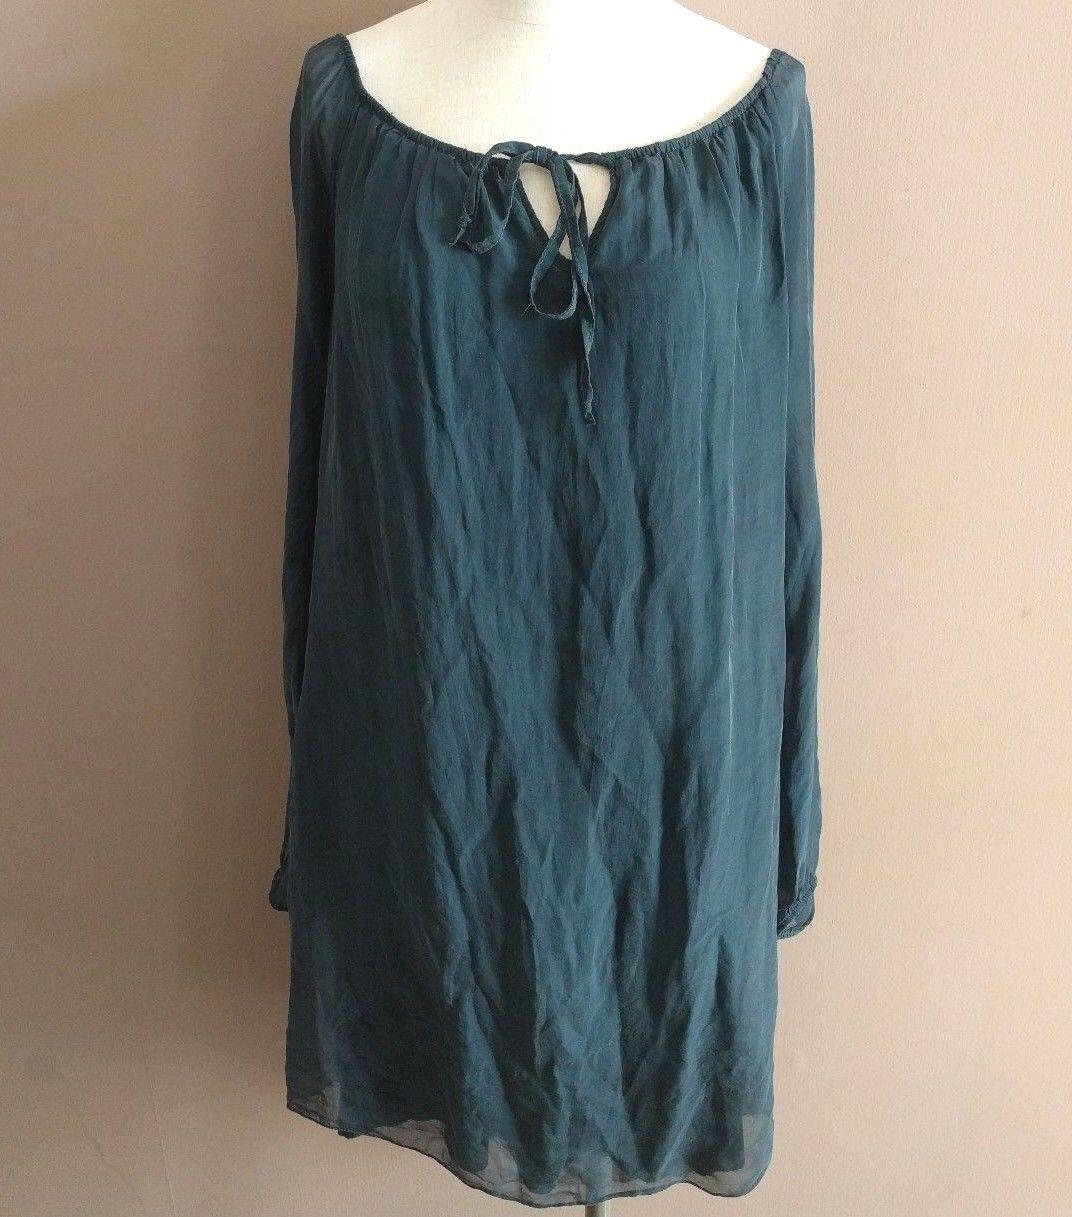 Sofia  Womens One Size Jade Green 100% Silk Shift Dress Sheer Sleeve Bateau